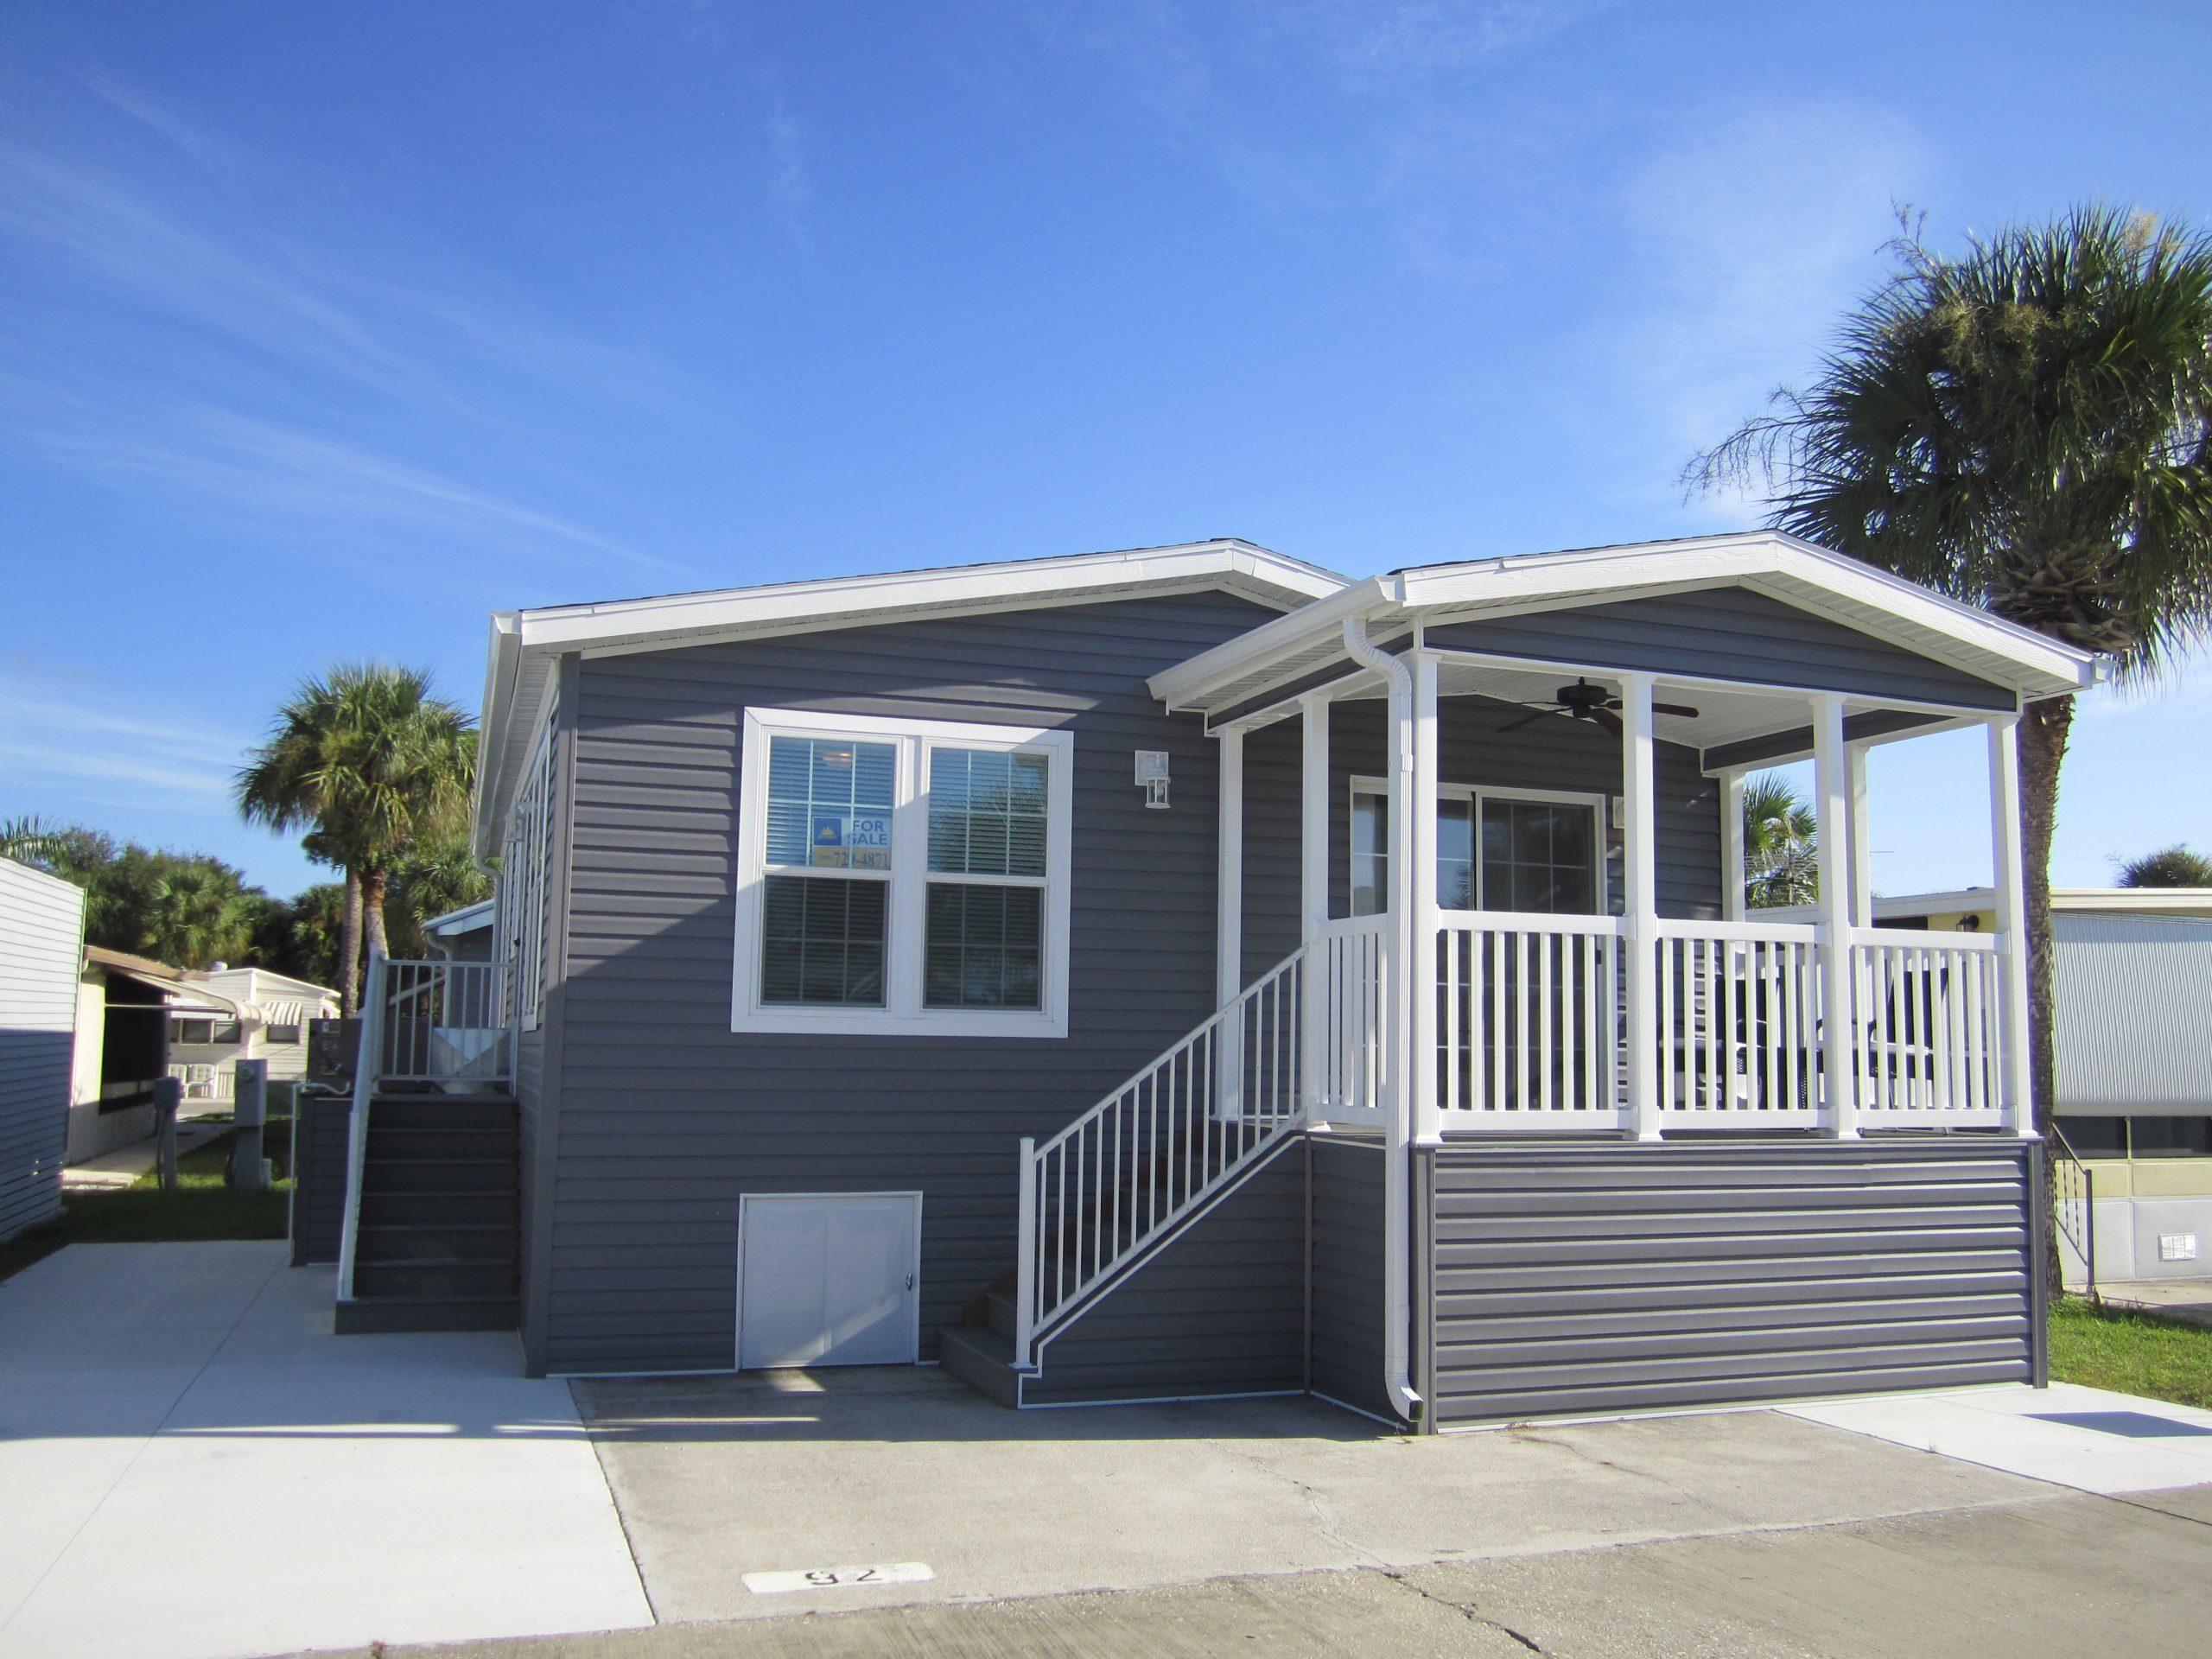 Sun RV - Vacation Homes